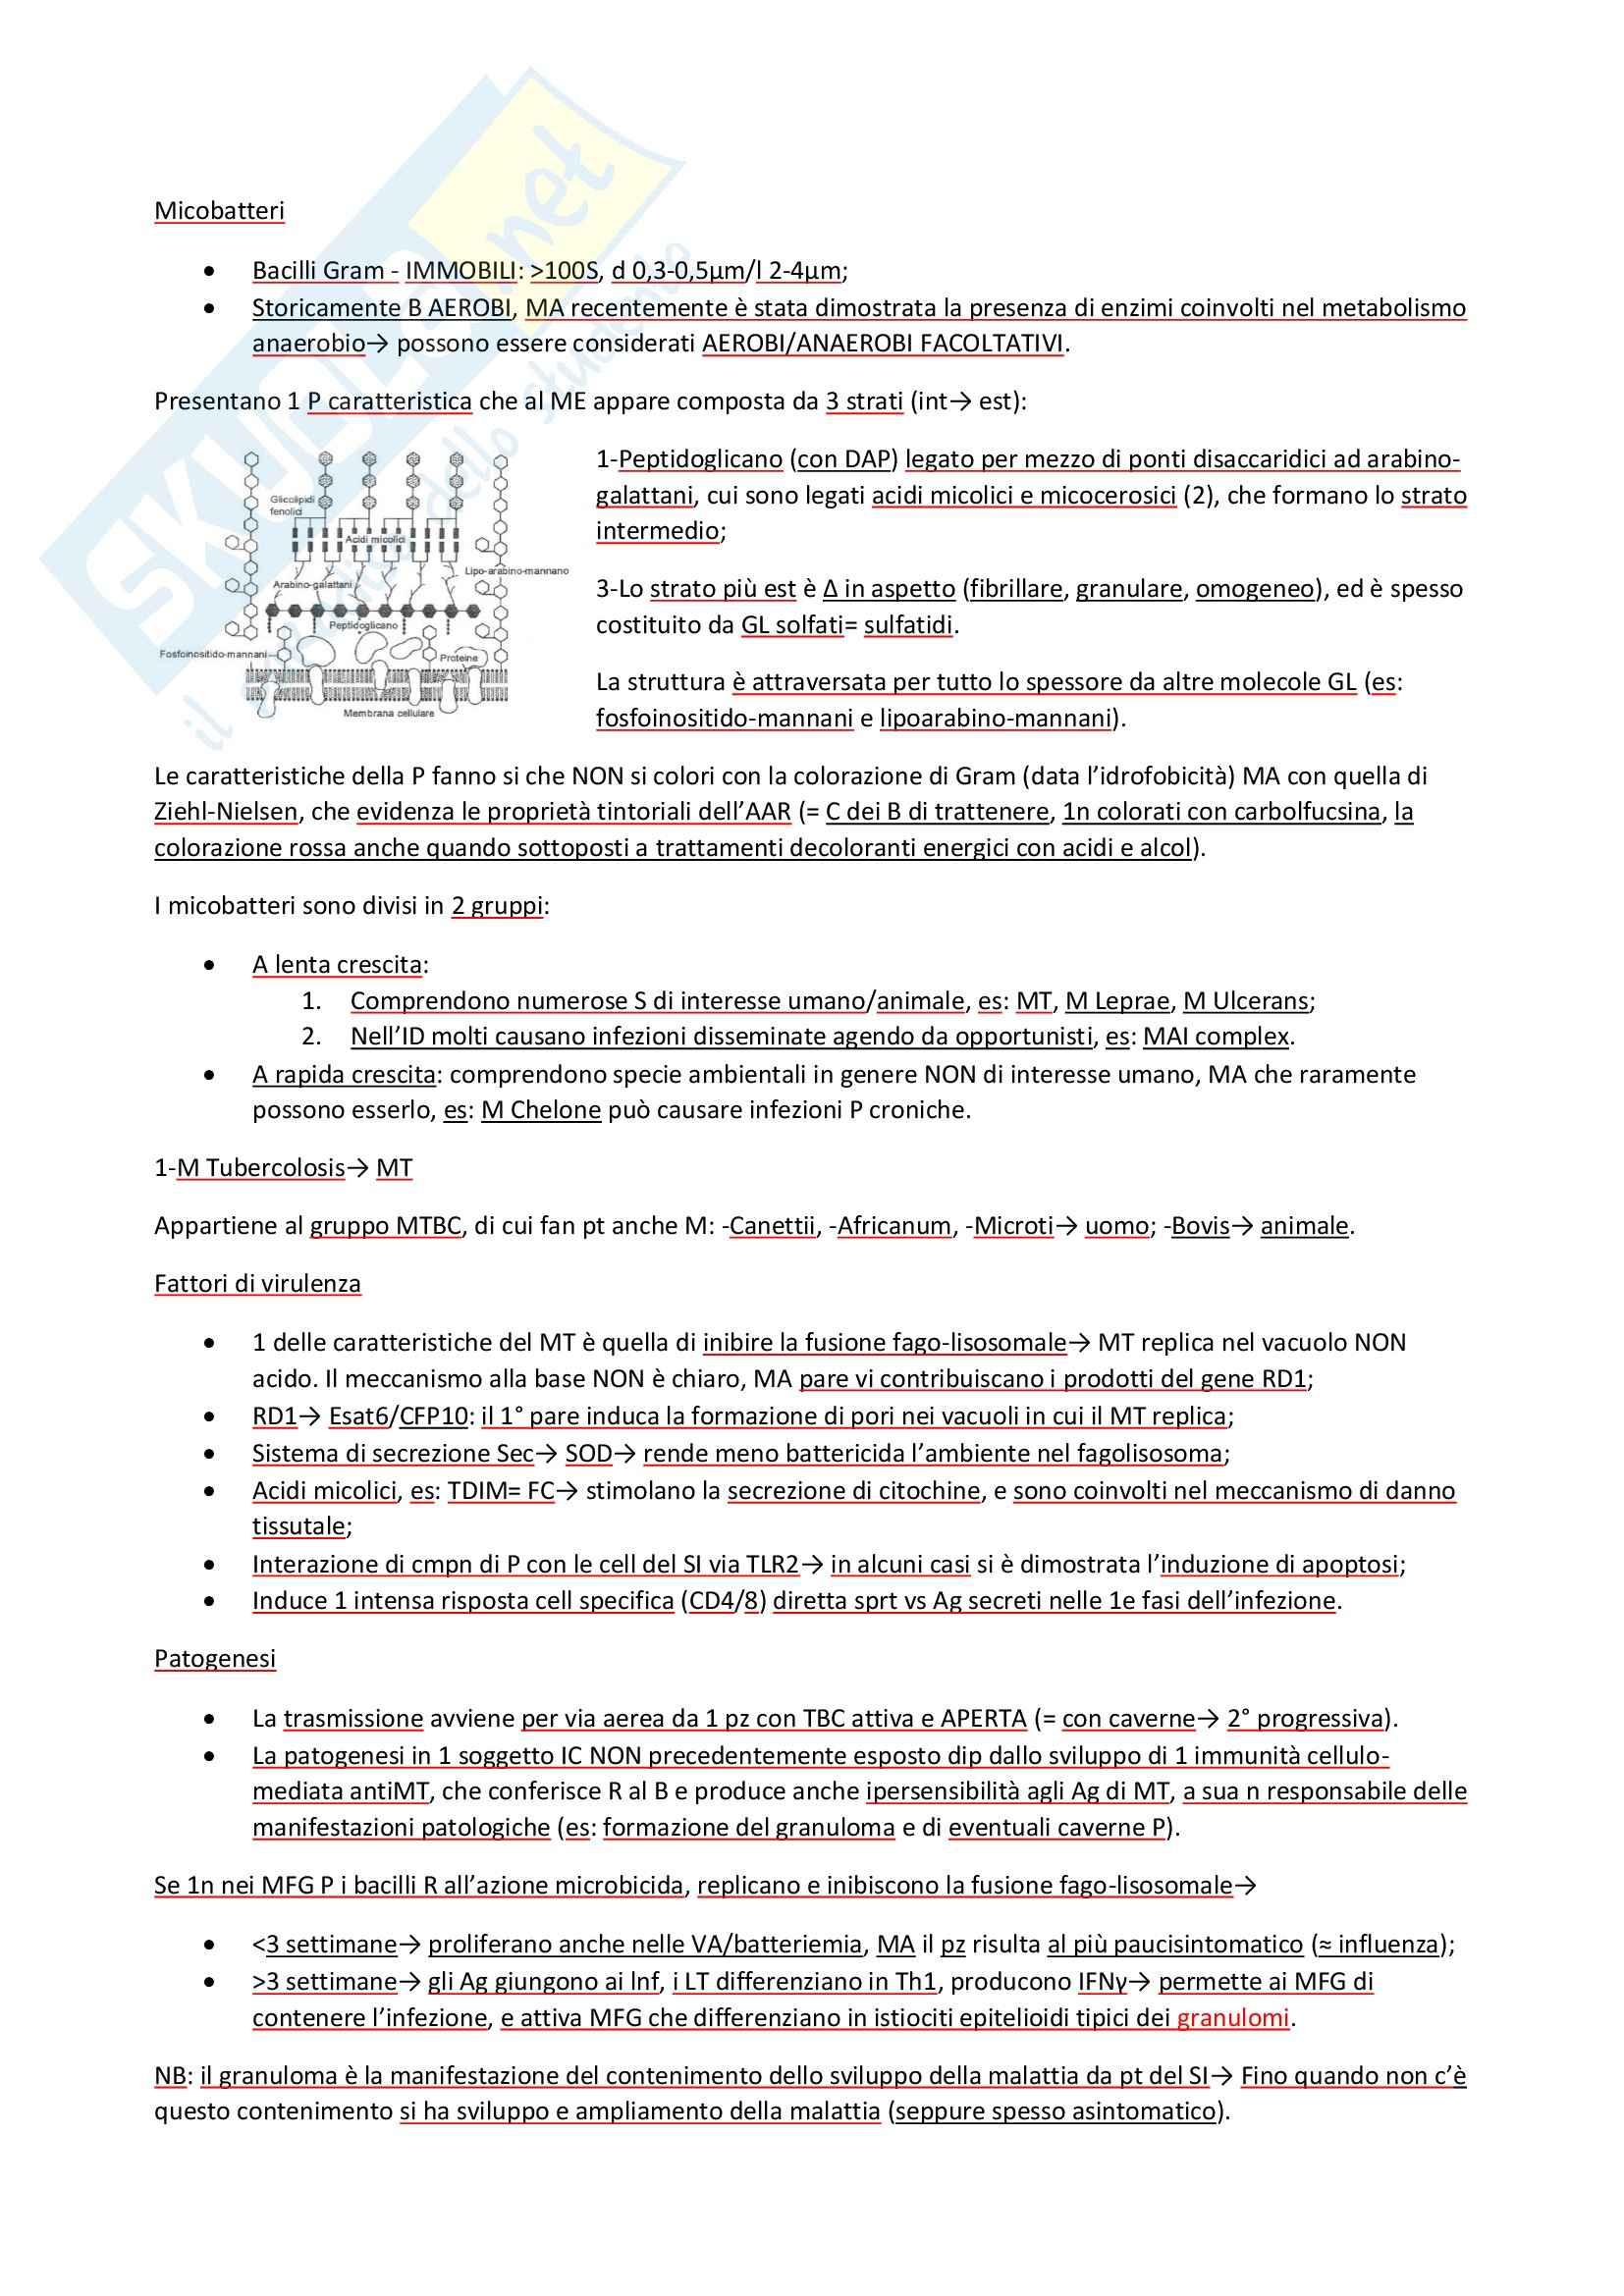 Microbiologia - Batteri Pag. 36